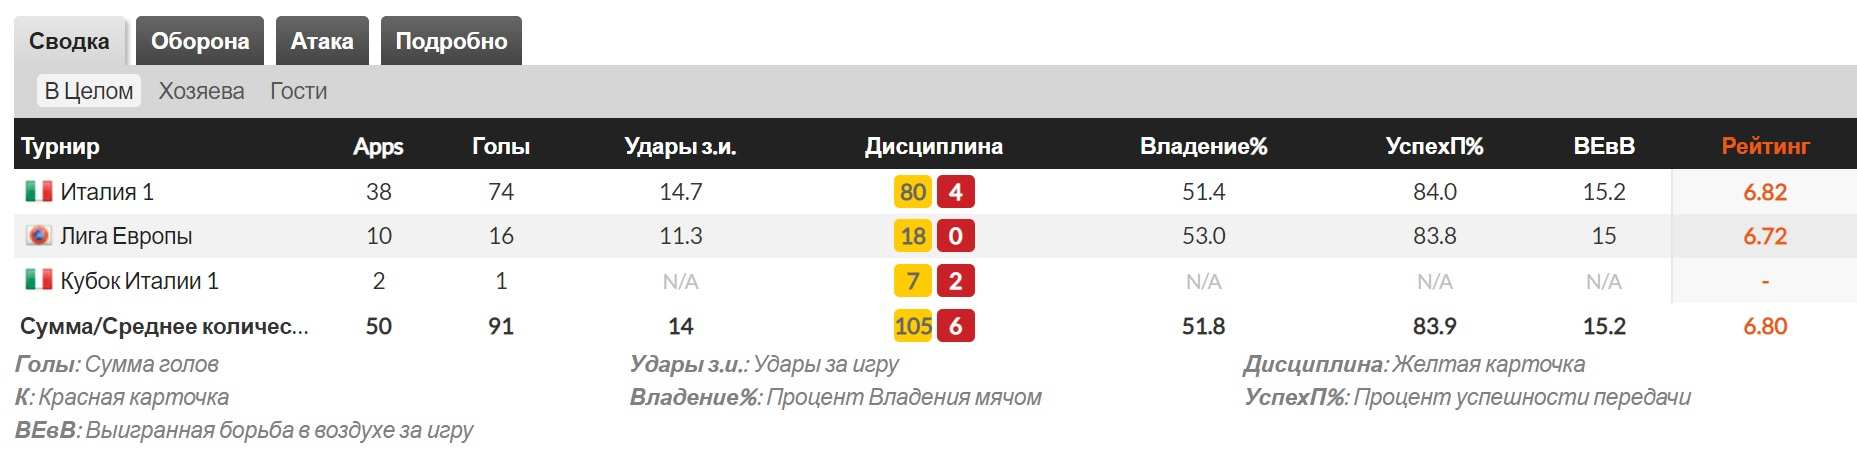 pokazateli Milana i statistika komandy v Serii A i drugih turnirah